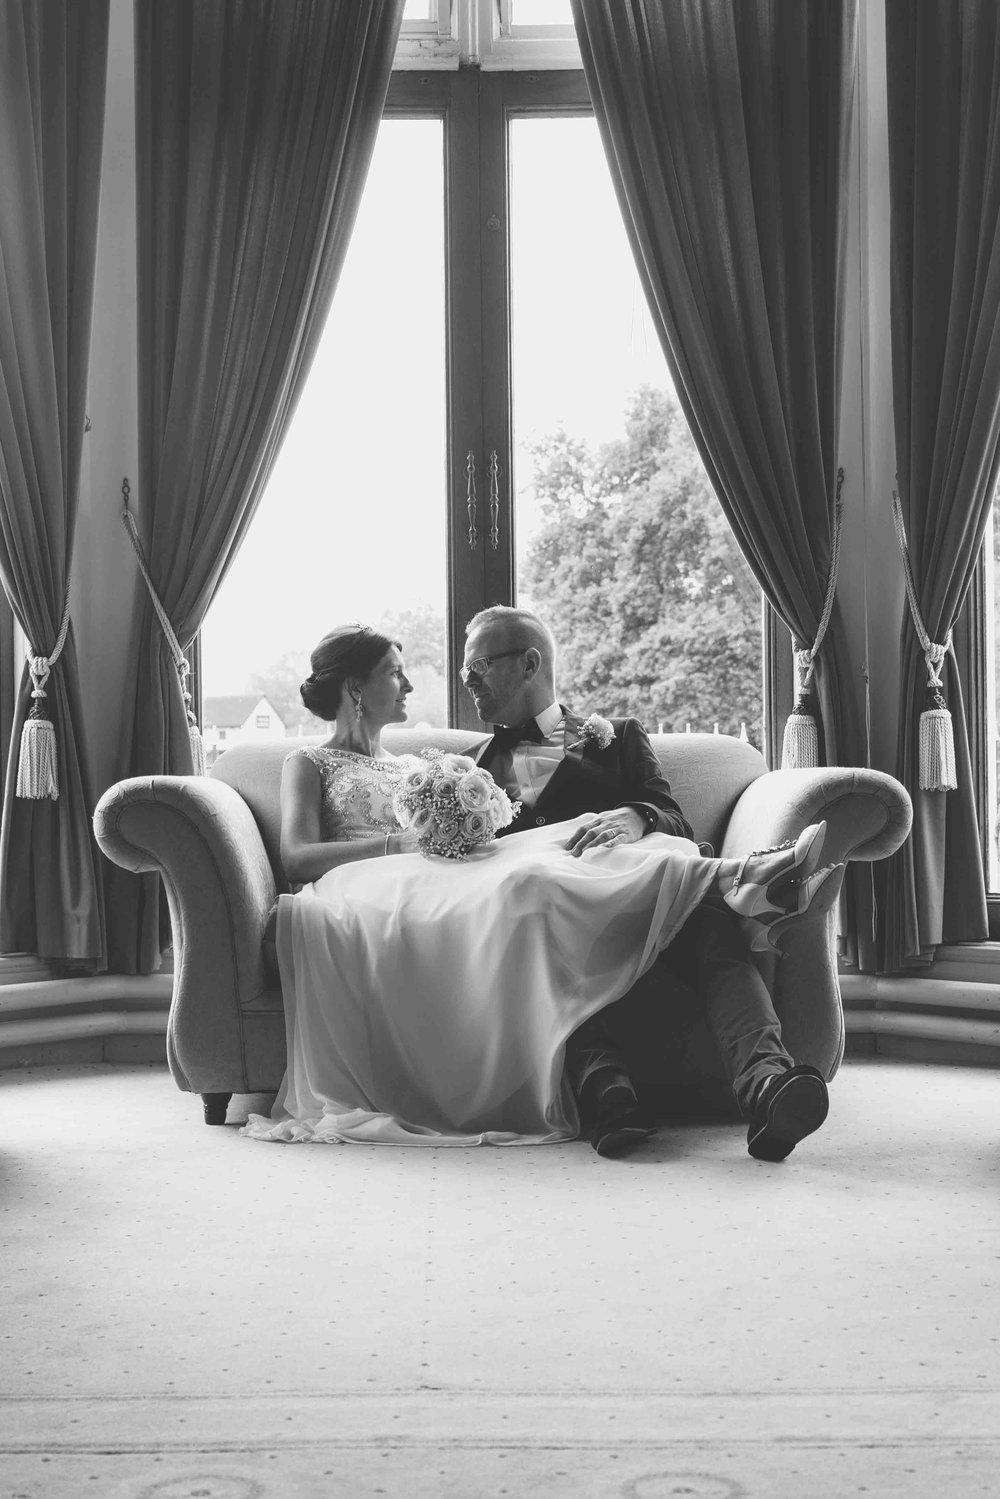 Runcorn-Town-Hall-Cheshire-Wedding-photographer-Heather-Elizabeth (39 of 89).jpg